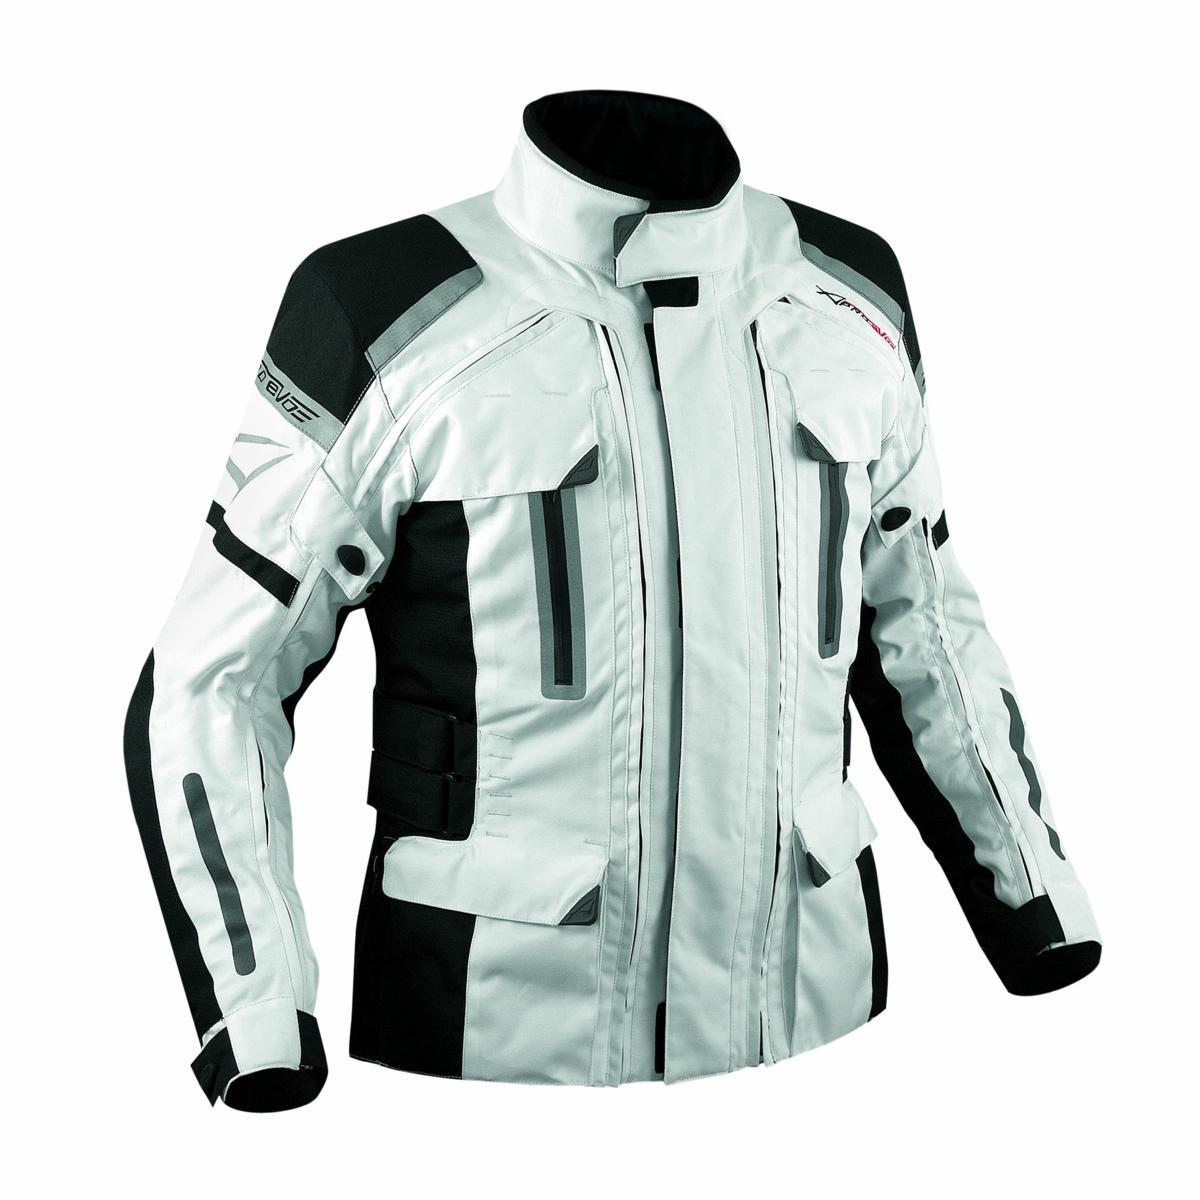 4-Capas-4-Seasons-chaqueta-desmontable-termica-impermeable-Moto-BMW-Blanco